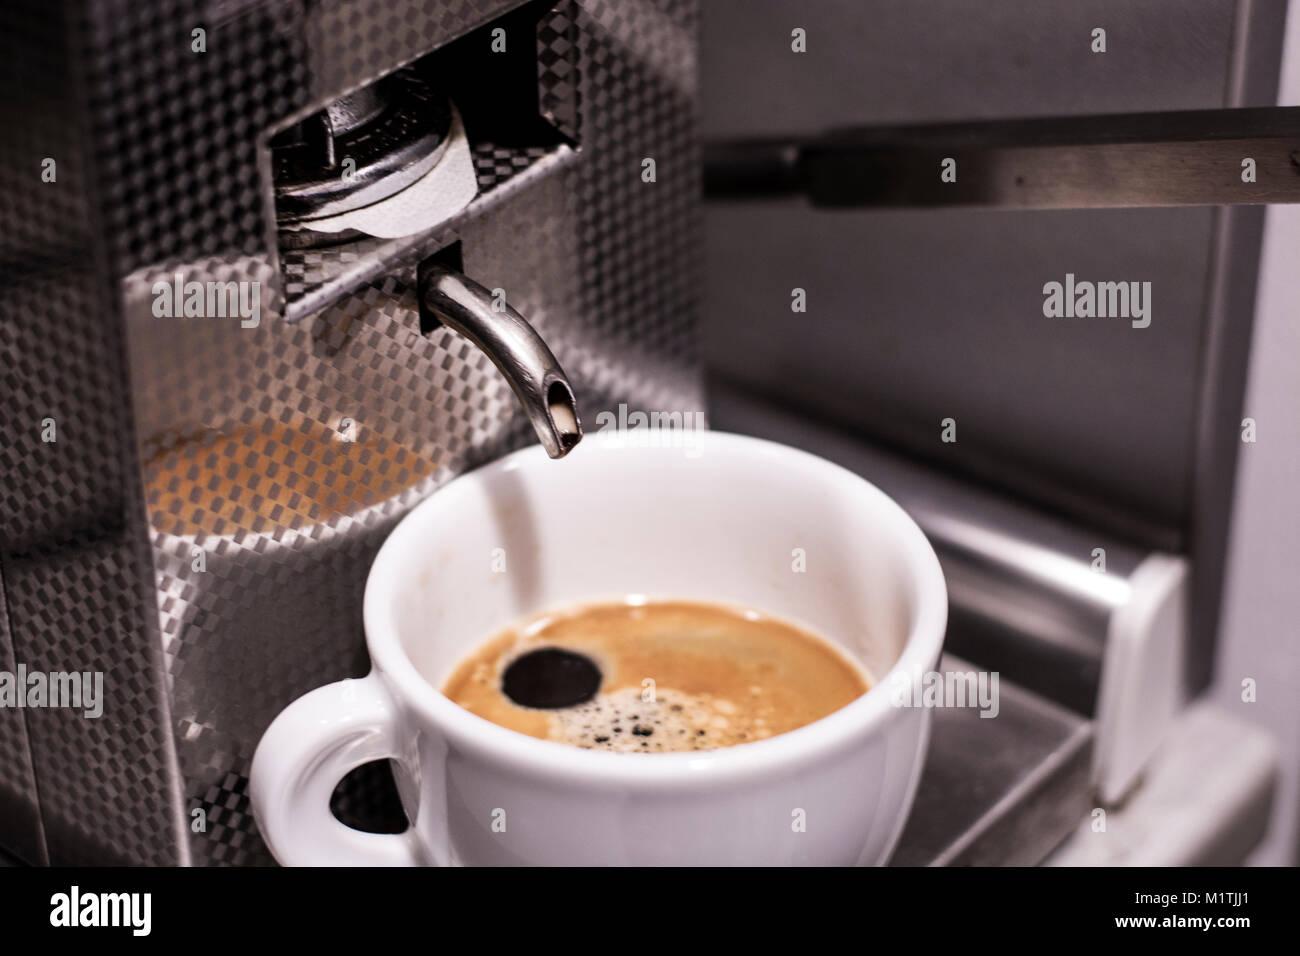 Fresh espresso in a white coffee cup - Stock Image